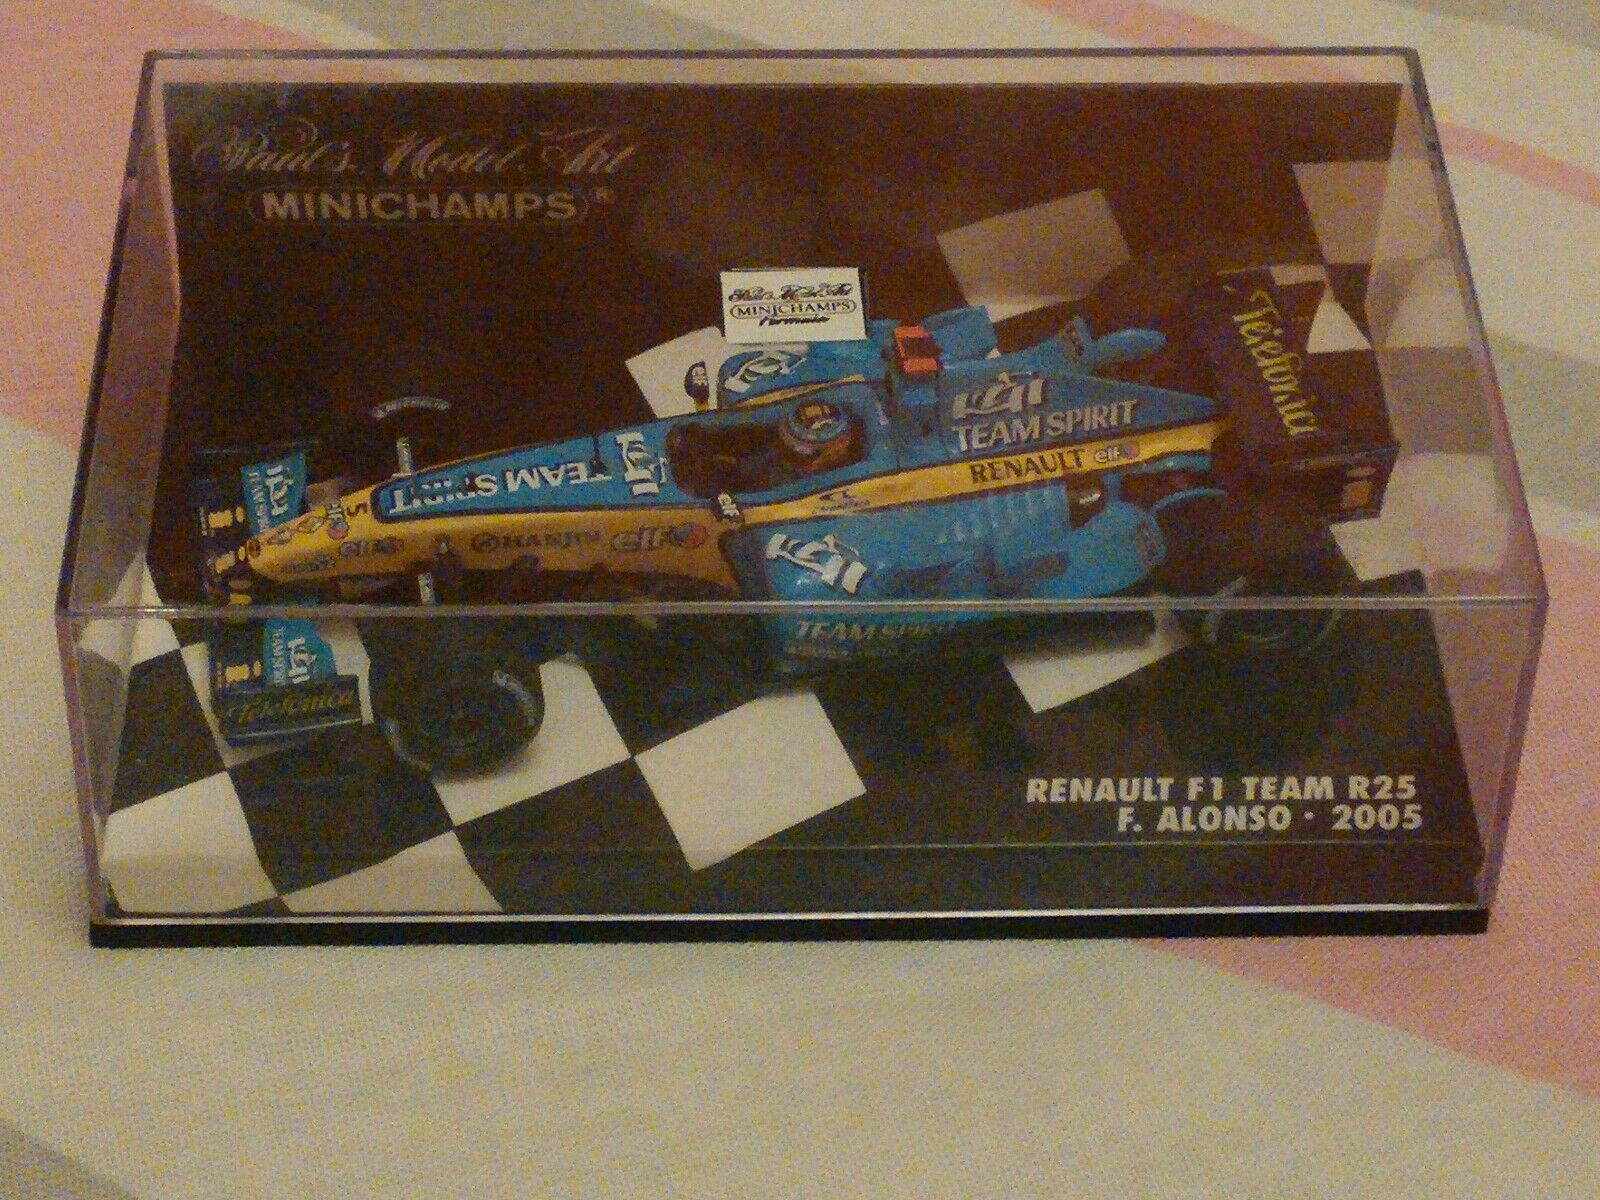 Minichamps 1 43 F.1 Fernando Alonso Renault F.1 R25 - World Champion 2005